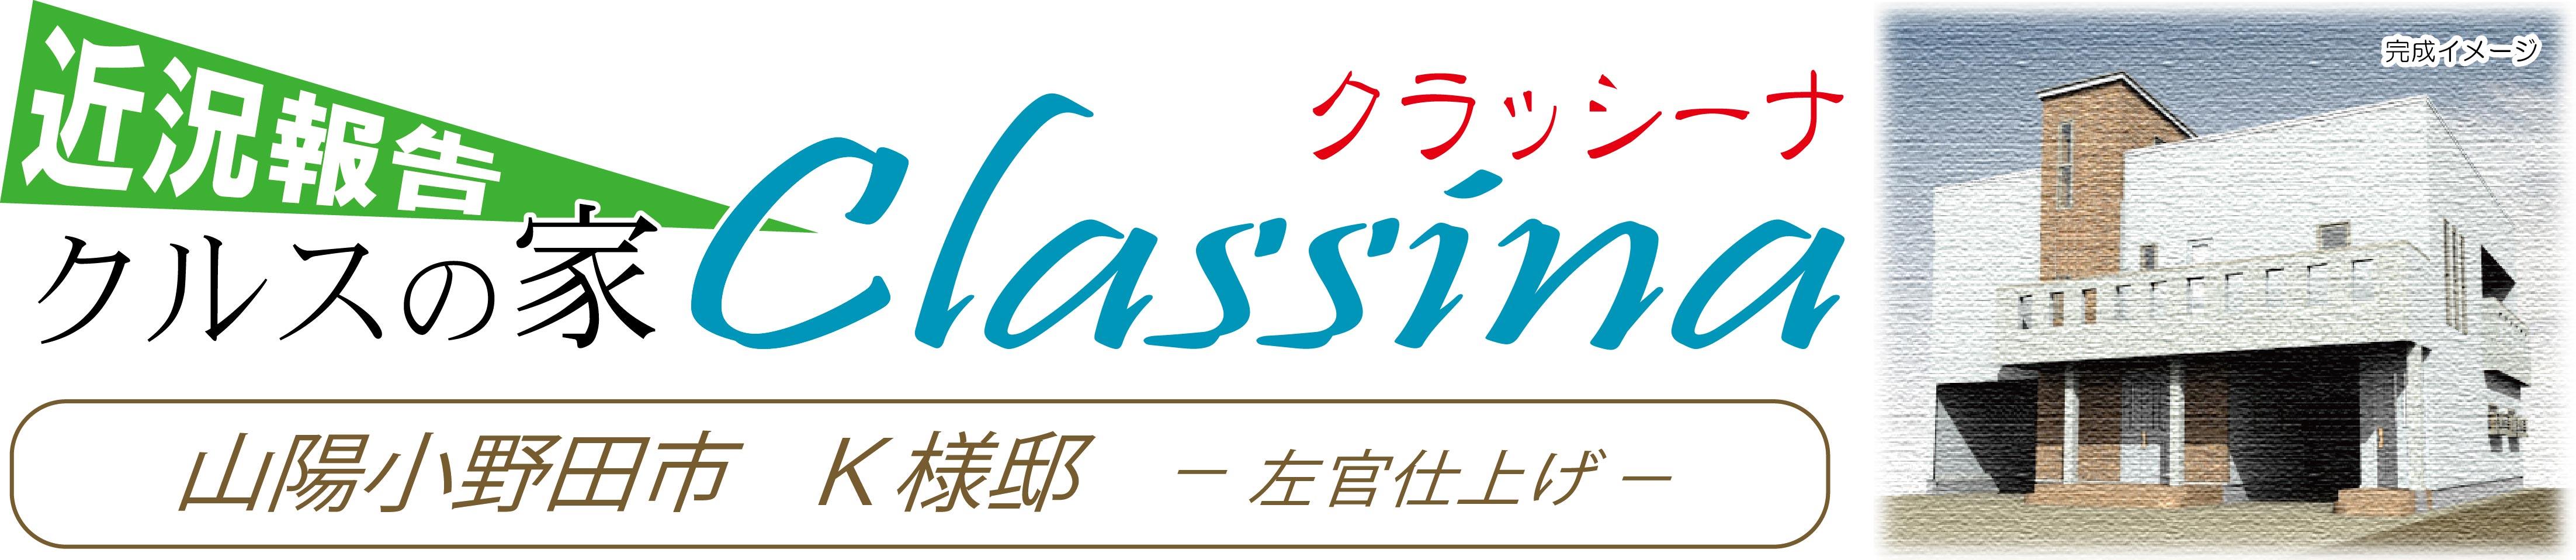 KuraSi-natu-sin90-02.jpg